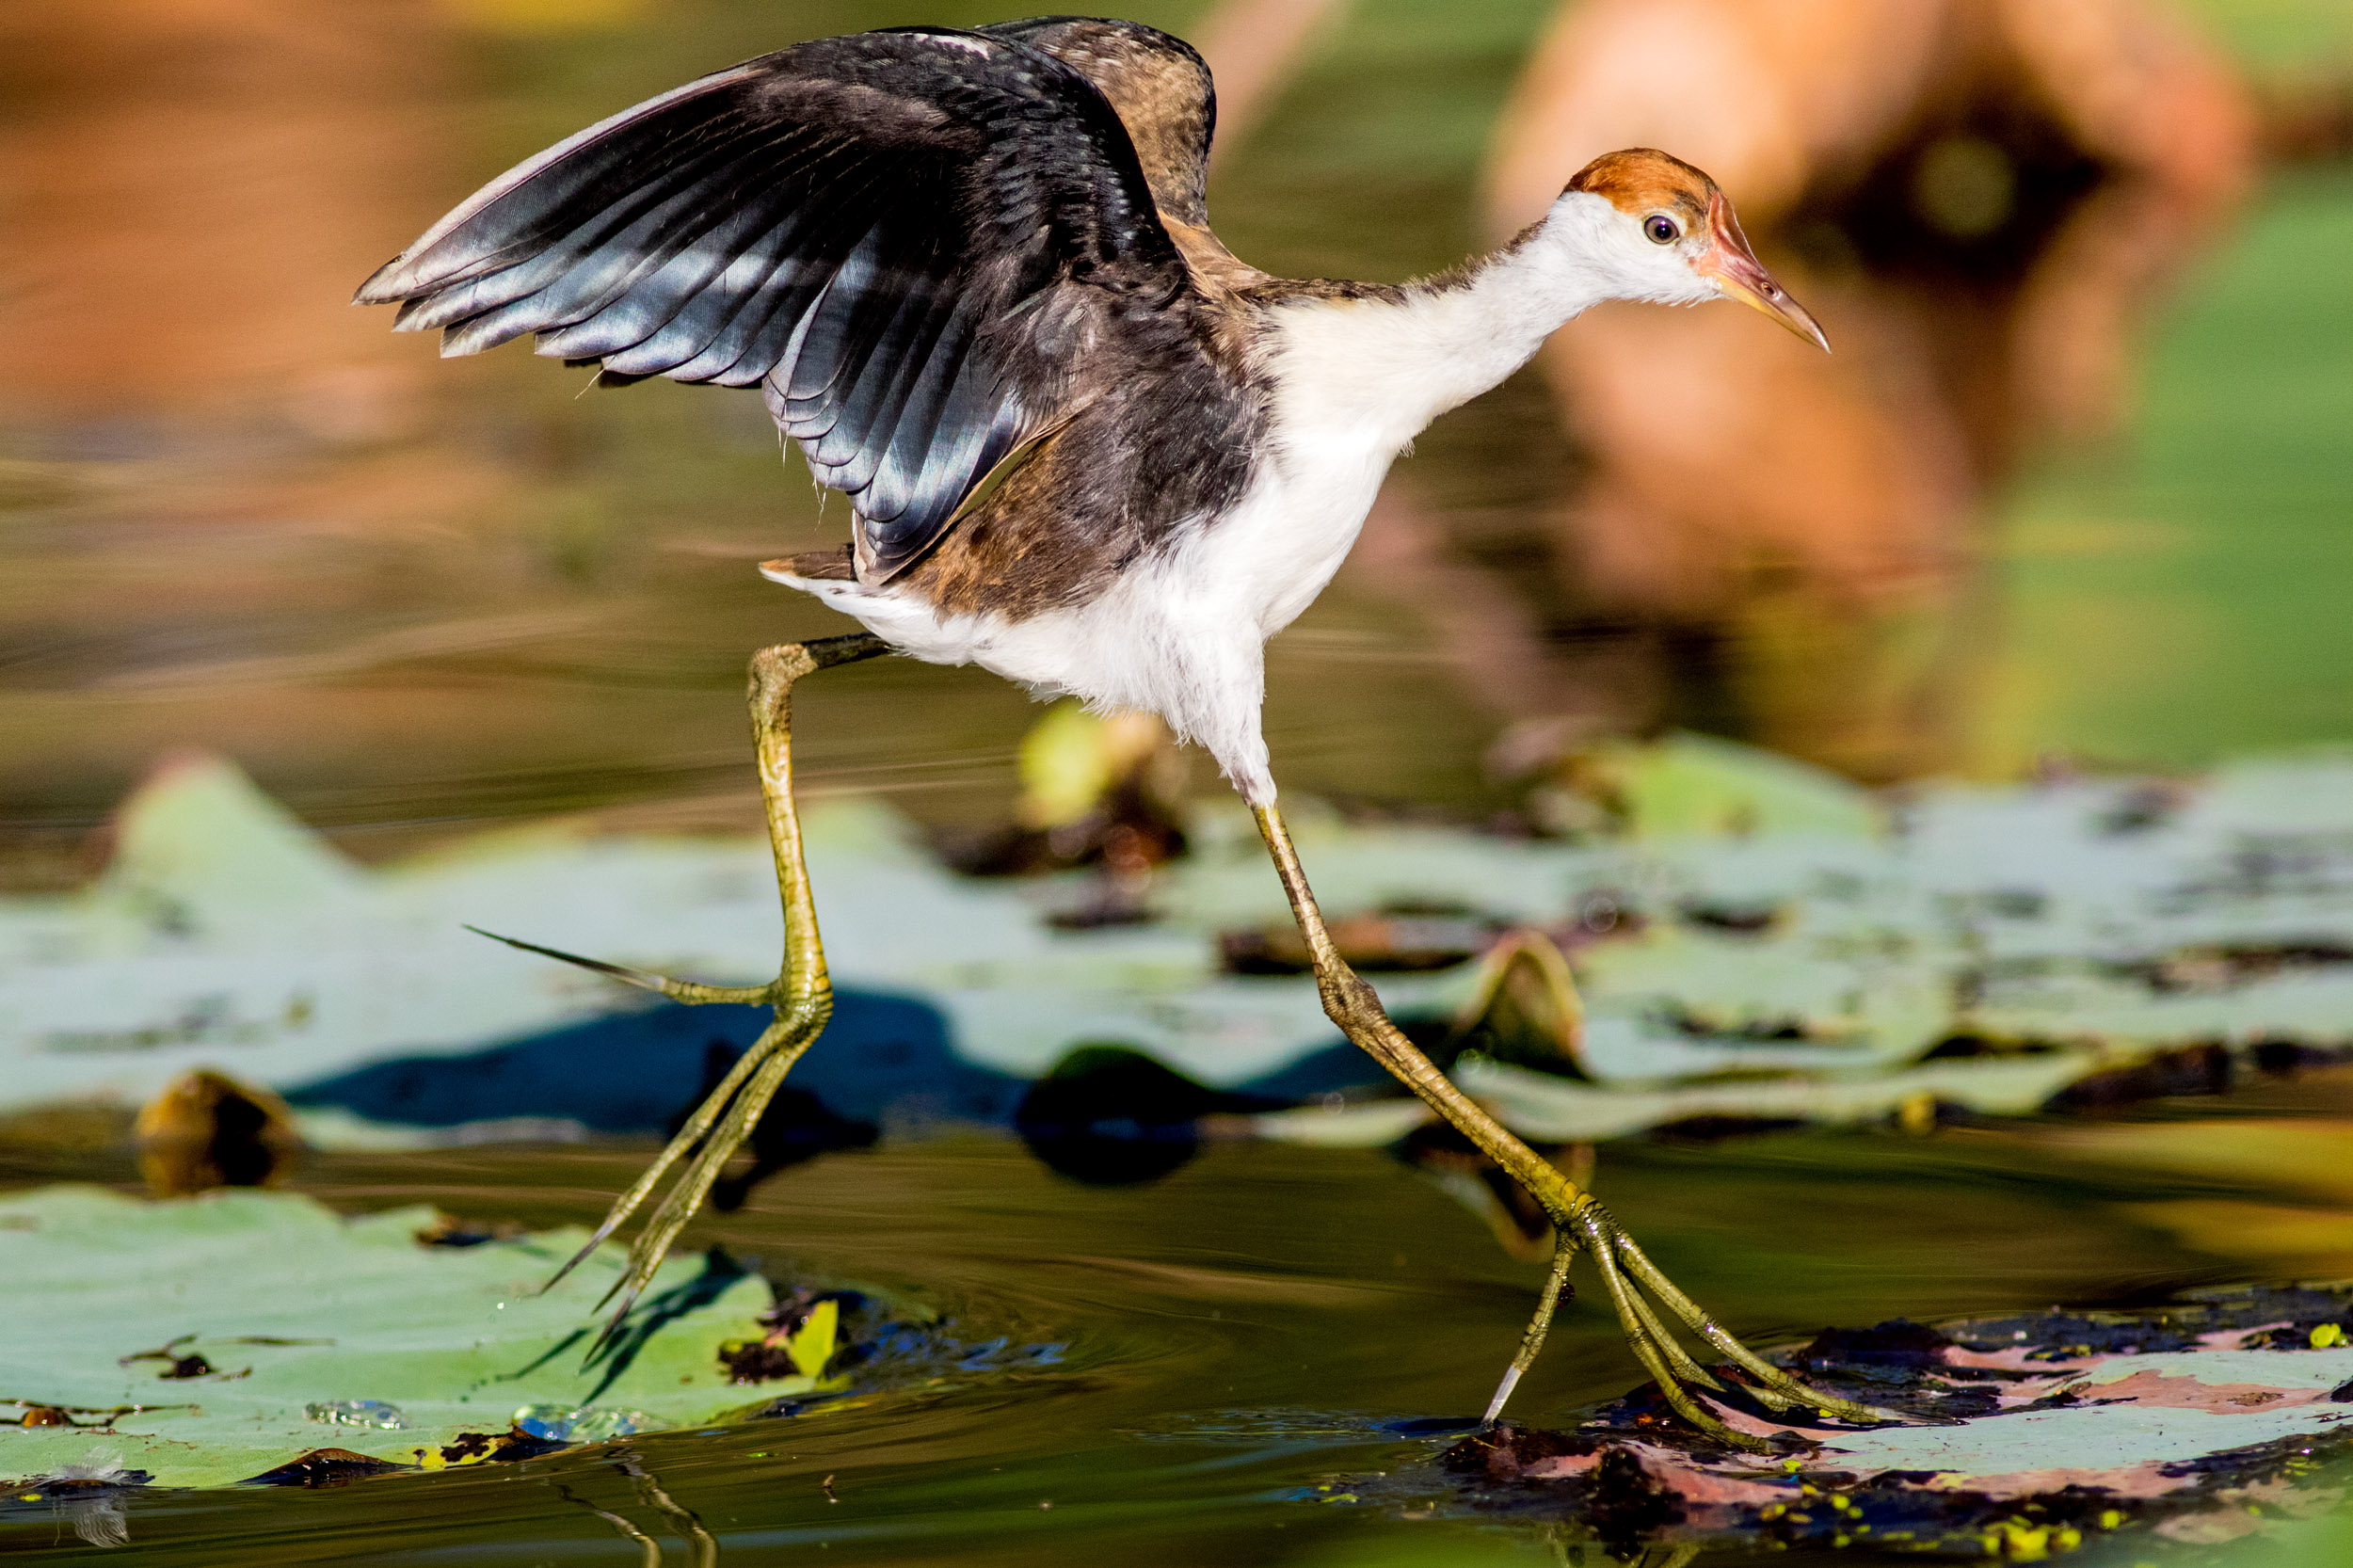 bird-life-kakadu-northern-territory.jpg